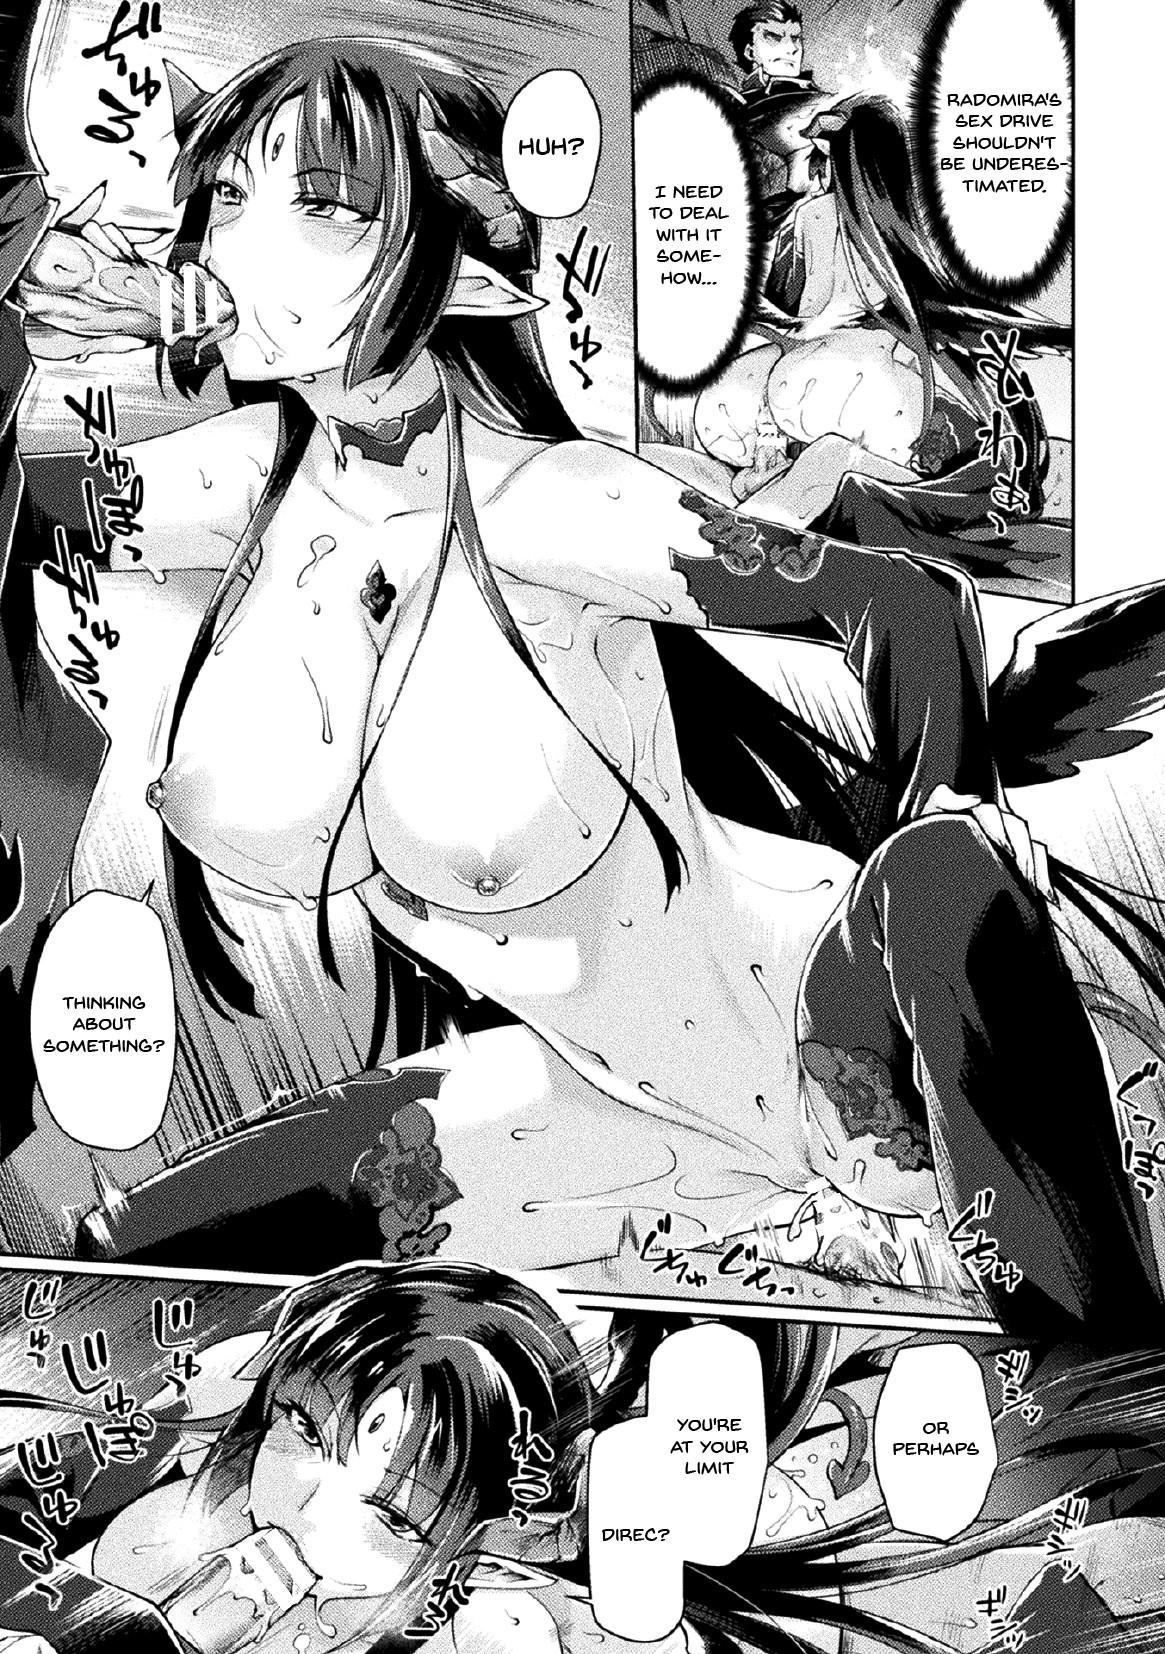 [Tsukitokage] Kuroinu II ~Inyoku ni Somaru Haitoku no Miyako, Futatabi~ THE COMIC   Kuroinu II ~Corrupted Town Stained With Lust~ THE COMIC Ch. 1 (Haiboku Otome Ecstasy Vol. 17) [English] {Doujins.com} [Digital] 10